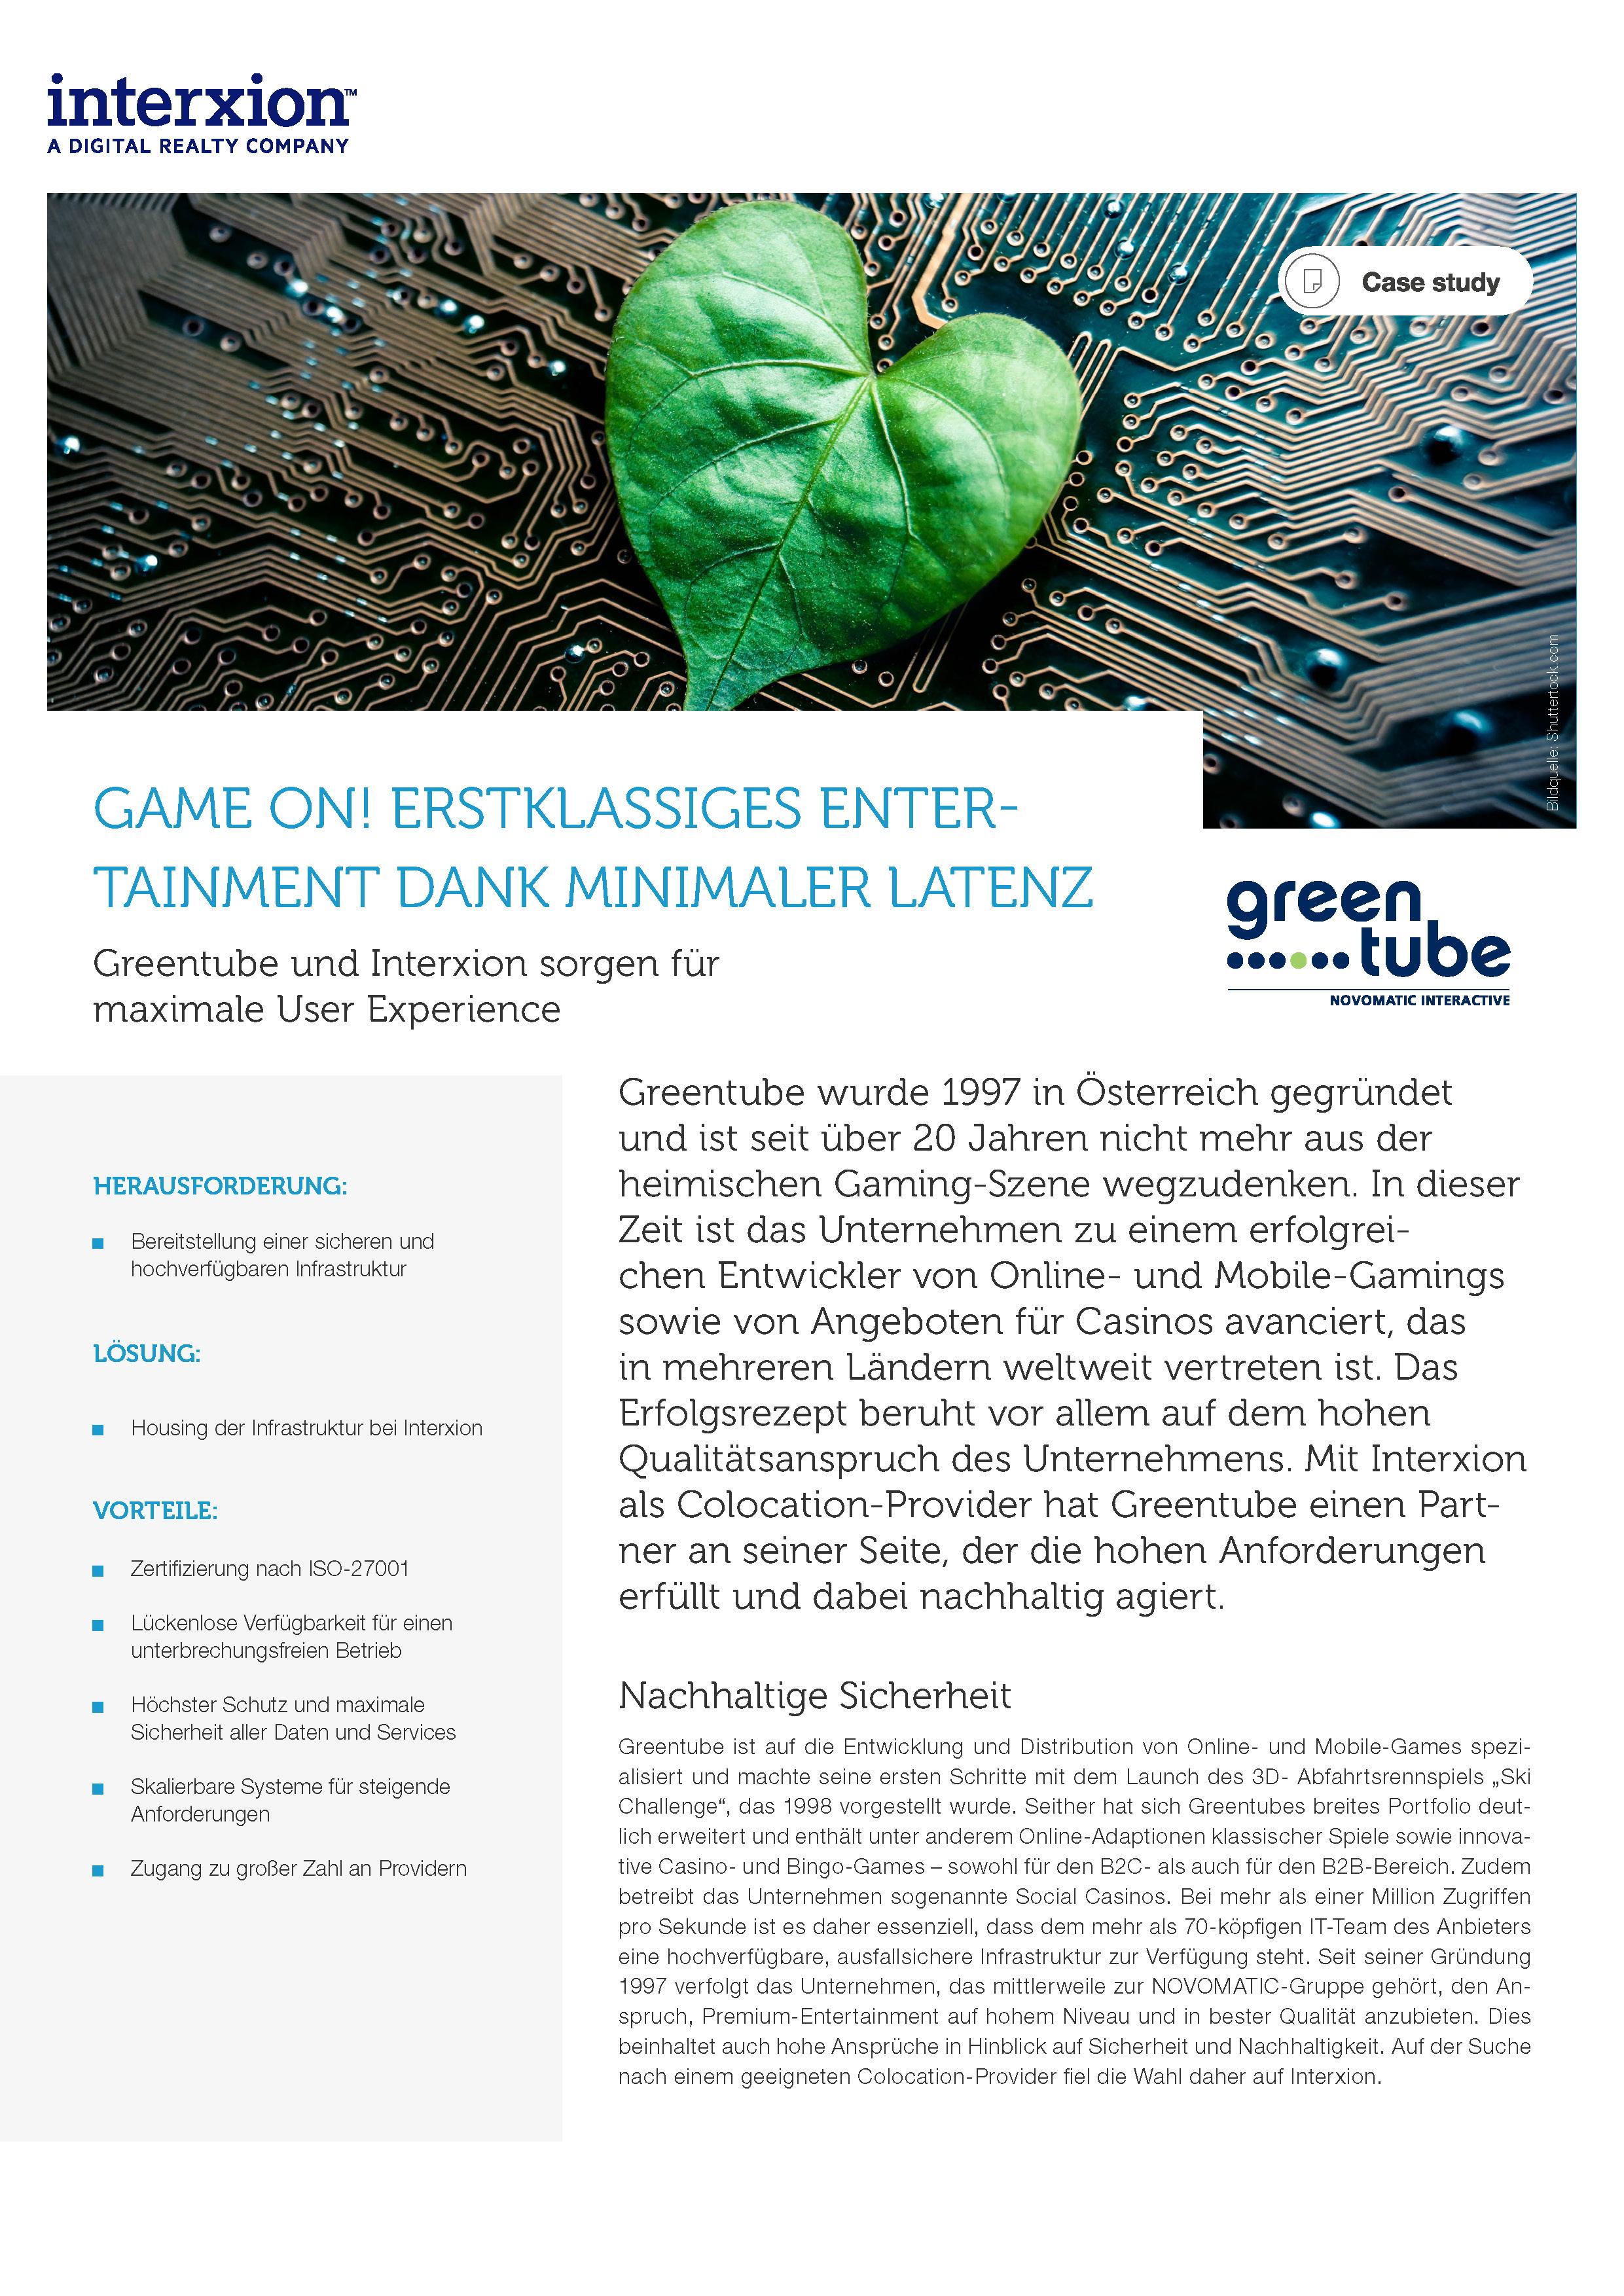 Case study over Greentube